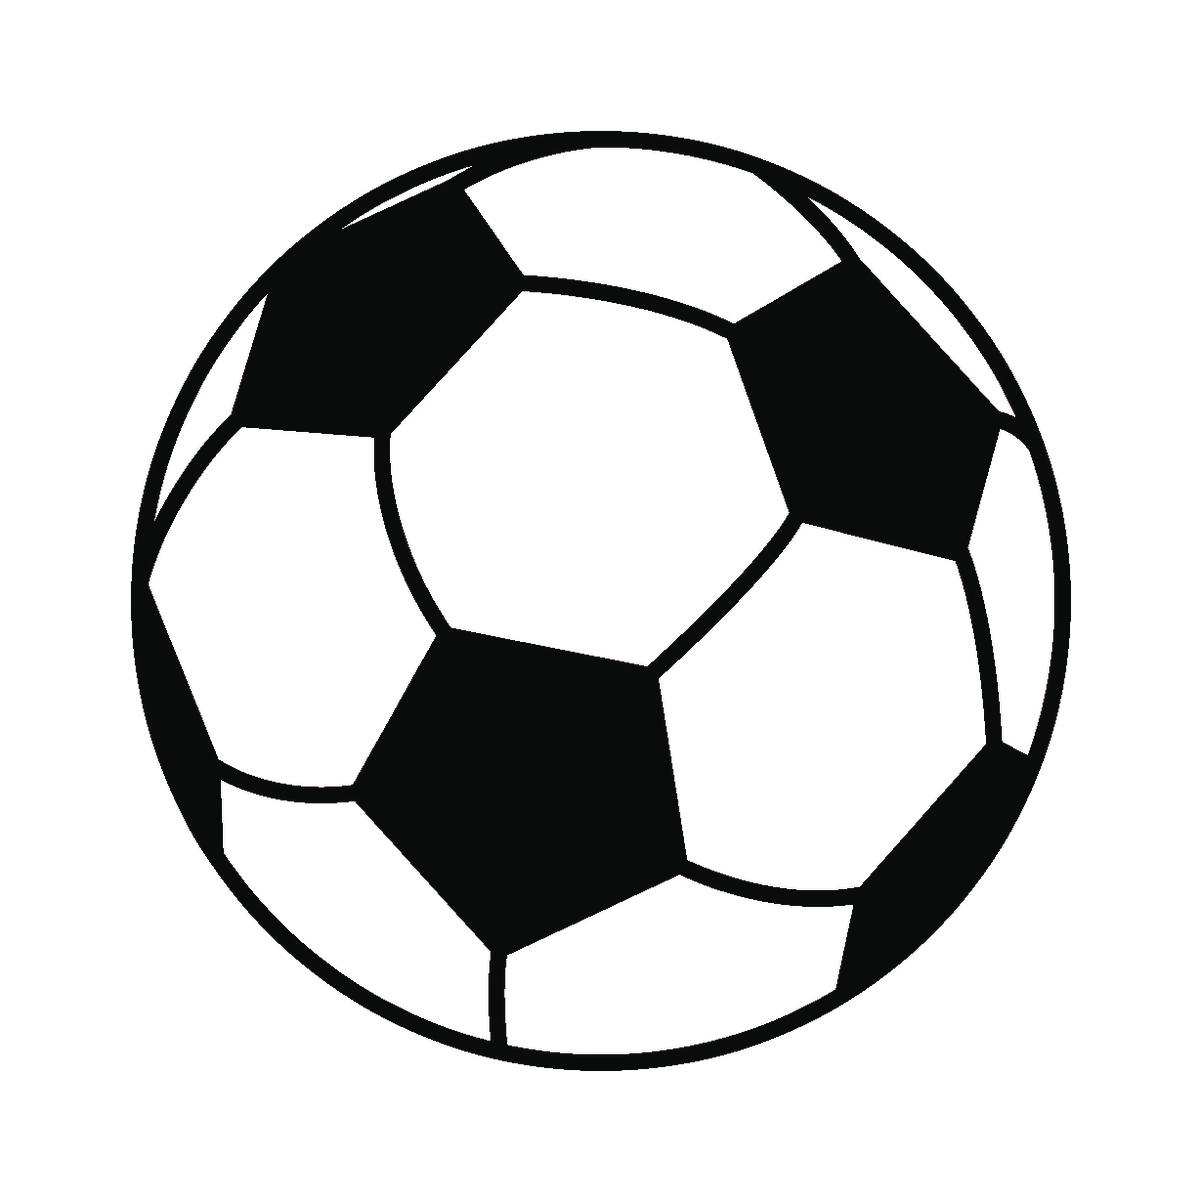 fußball bilder gratis